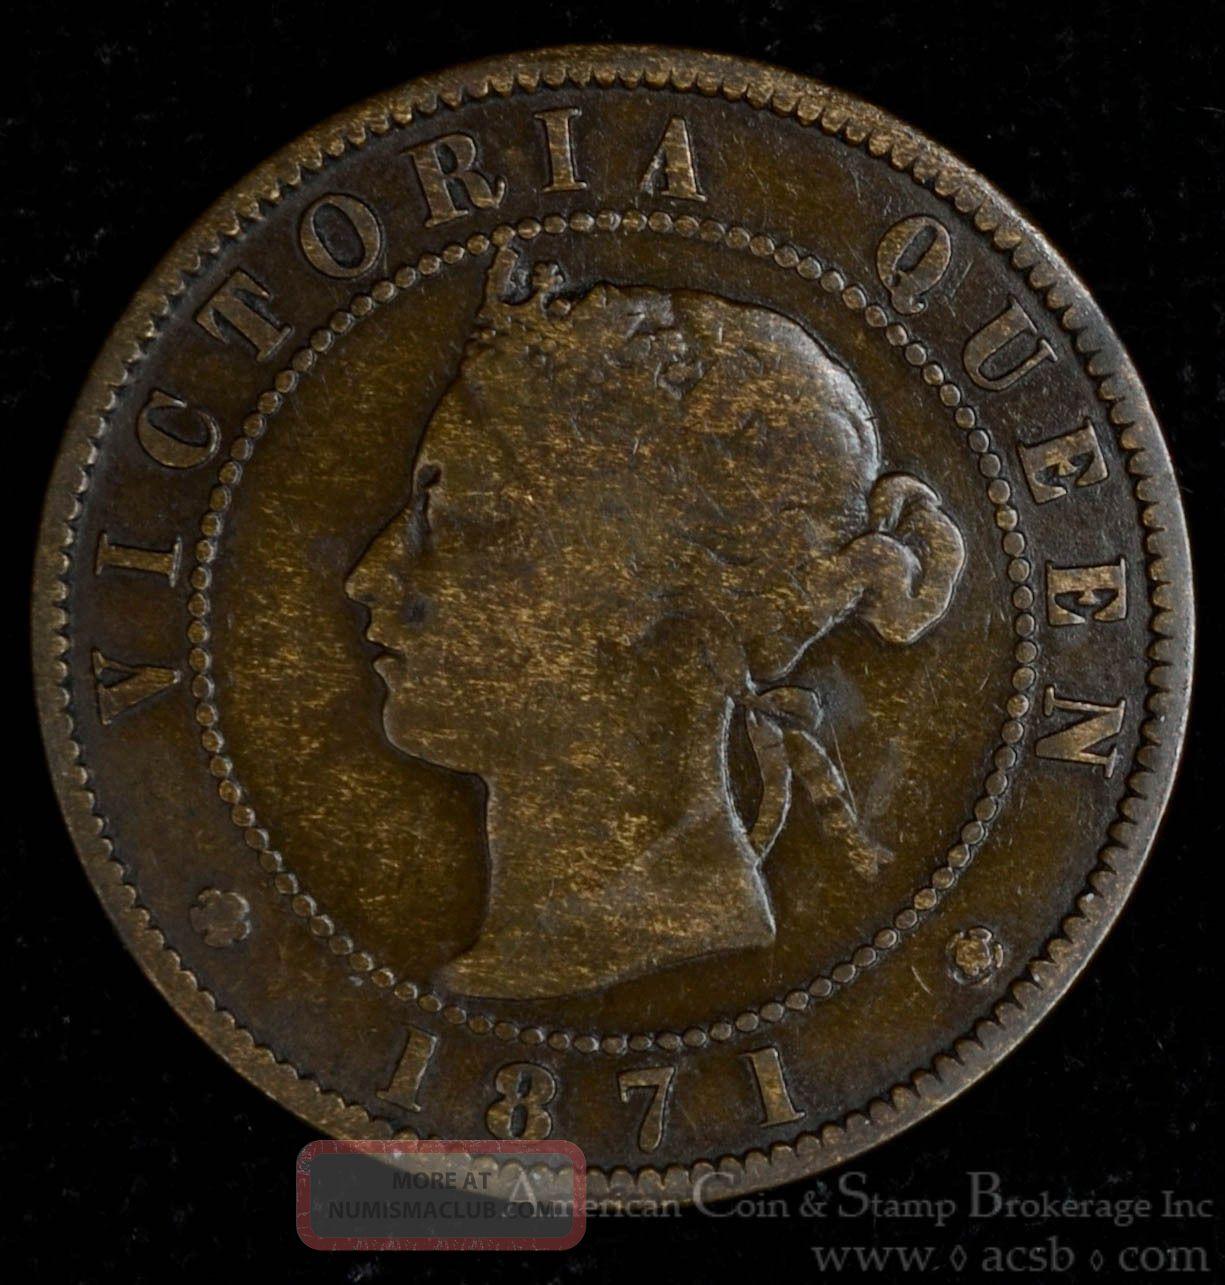 Prince Edward Island 1 Cent 1871 Bronze Km 4 Canada Queen Victoria Coin Rotation Coins: Canada photo